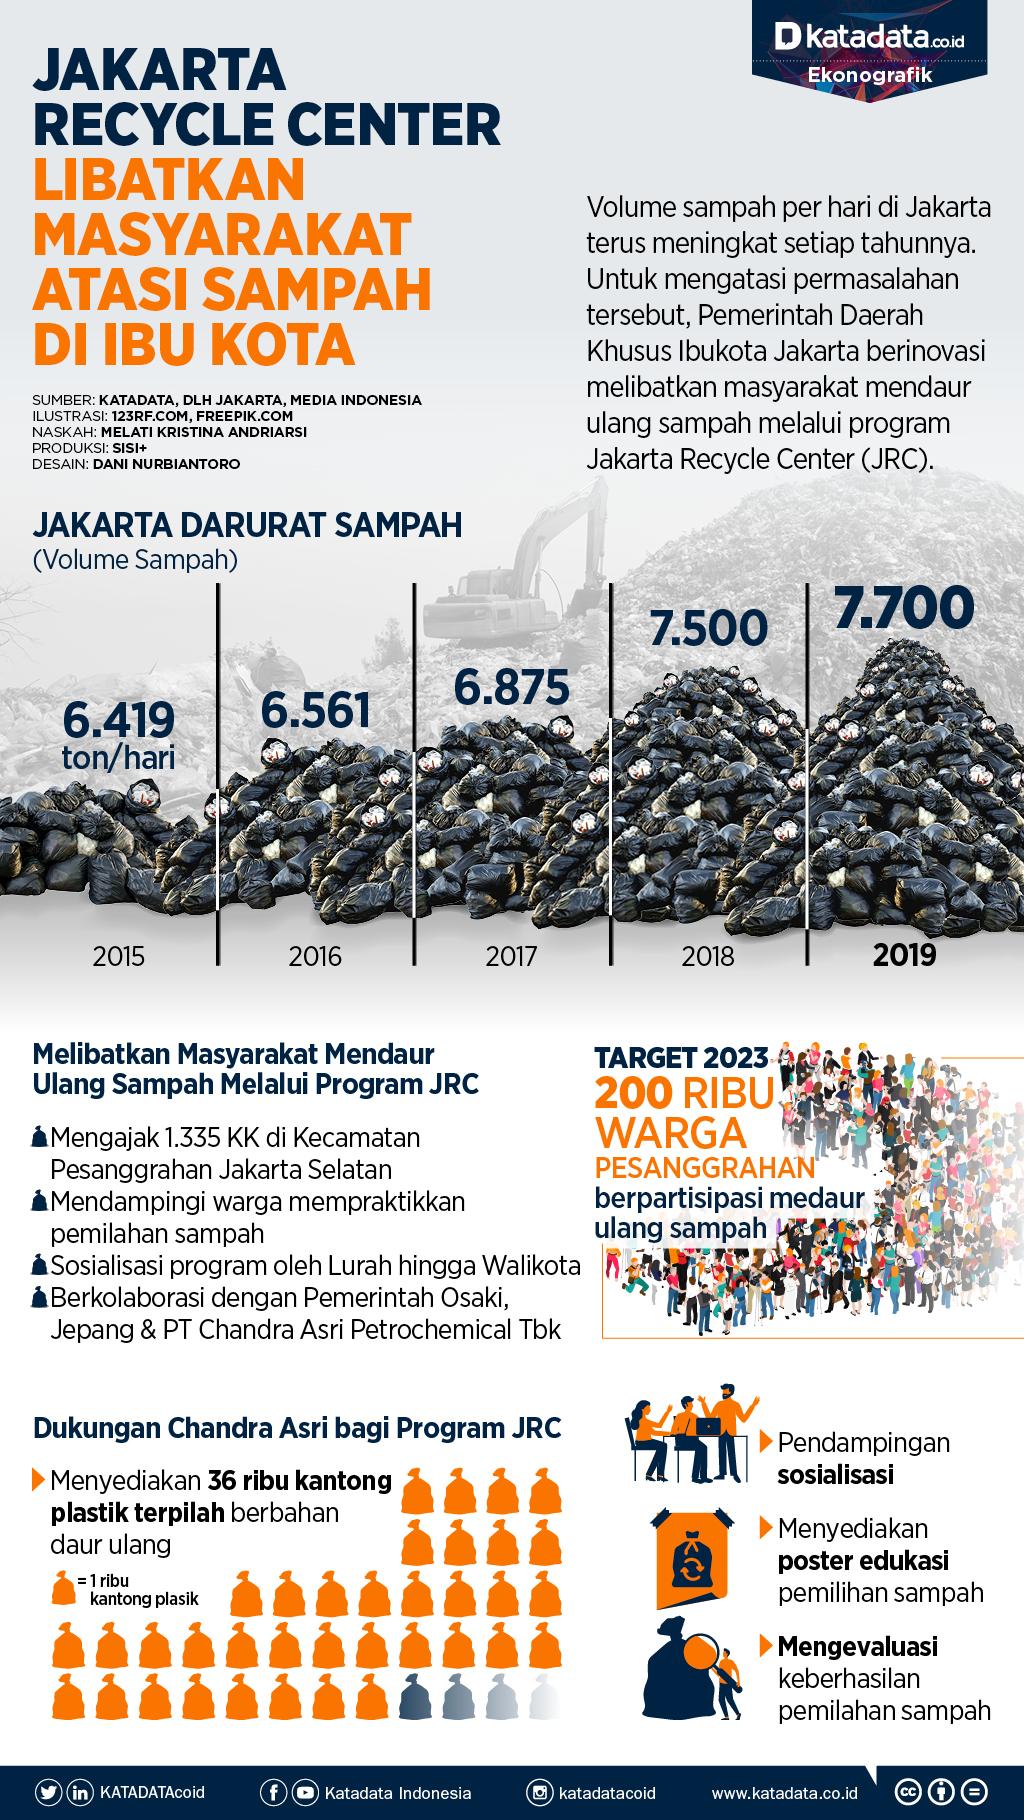 Jakarta recycle center